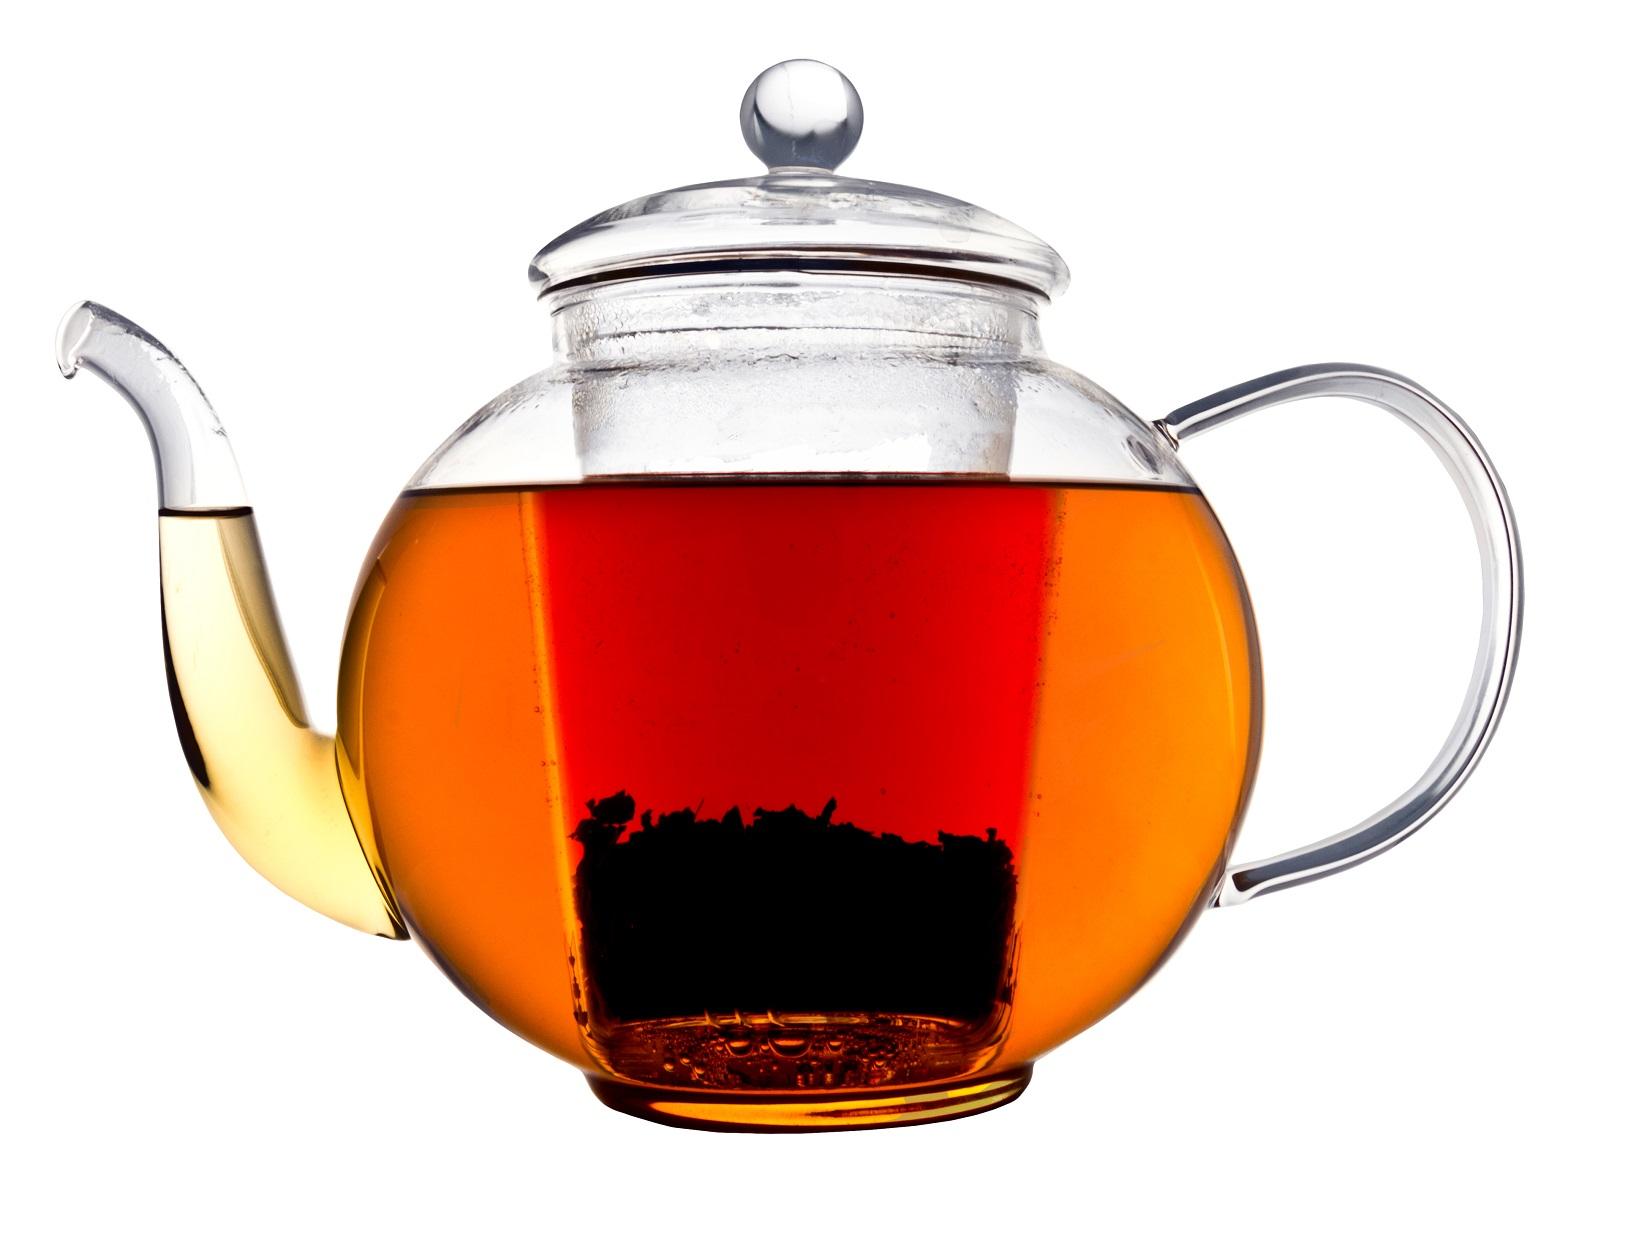 Teekanne Glas Verona Bredemeijer 1,5L.